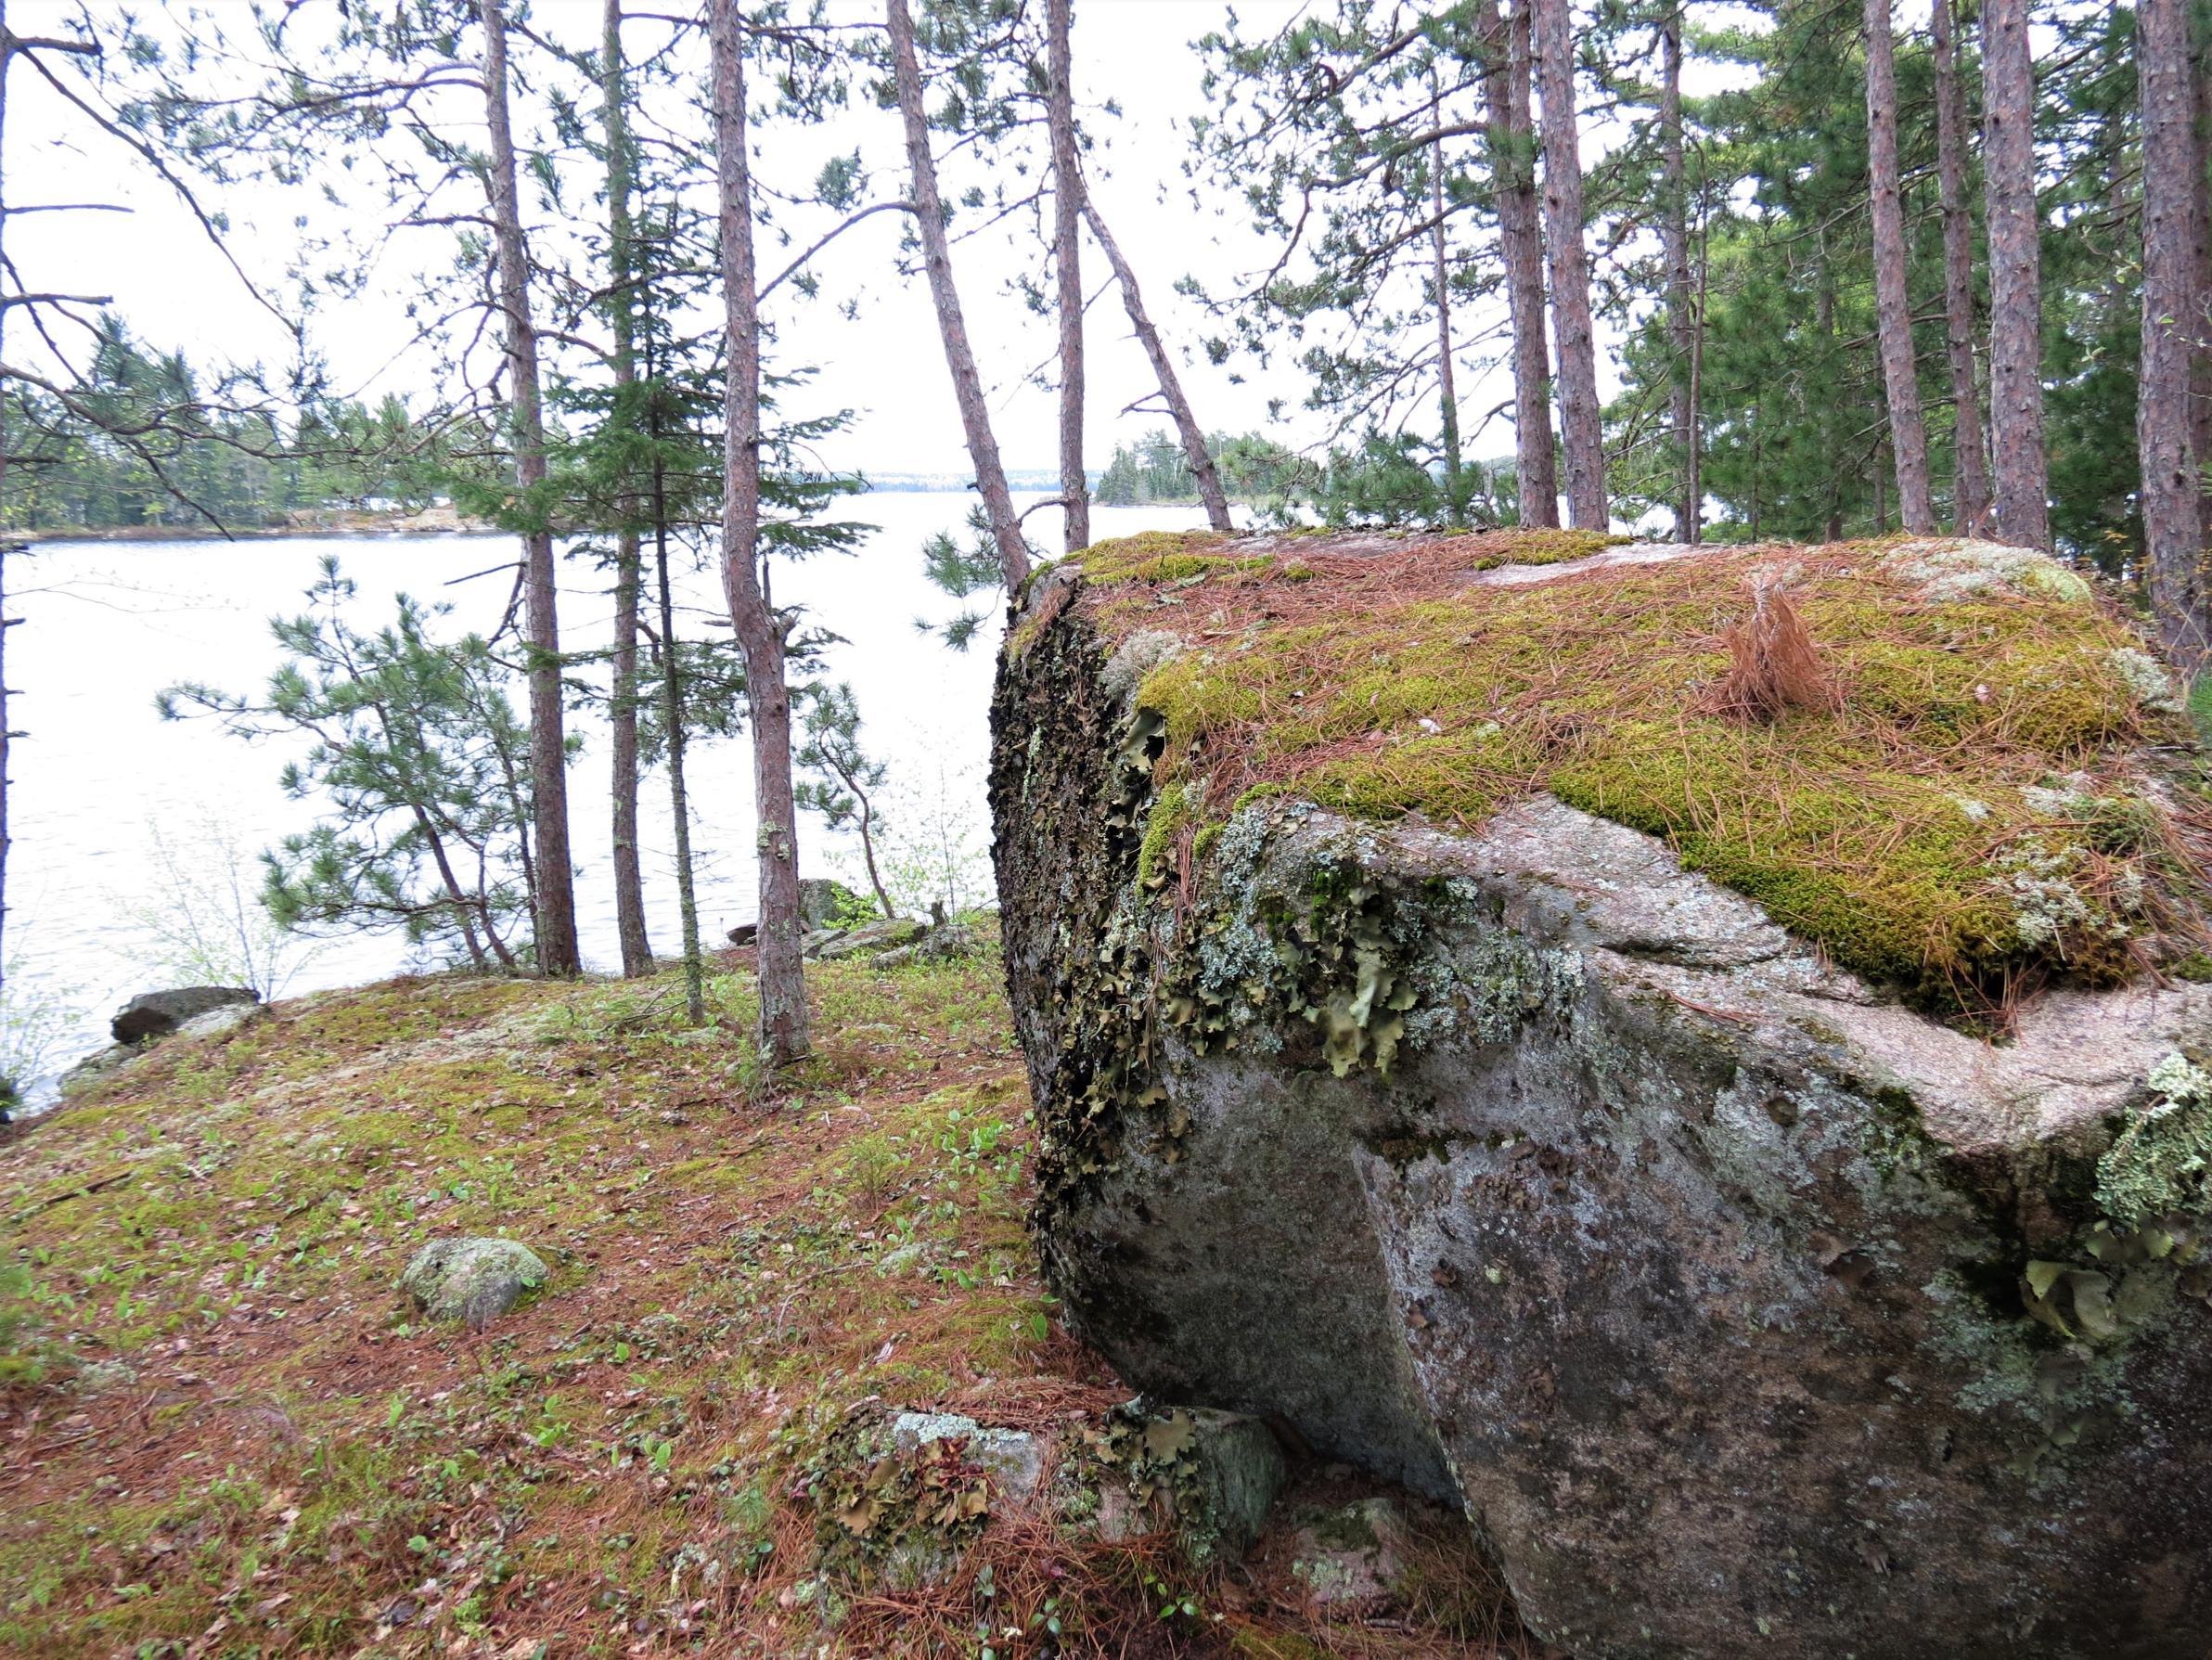 I. Mossy rock